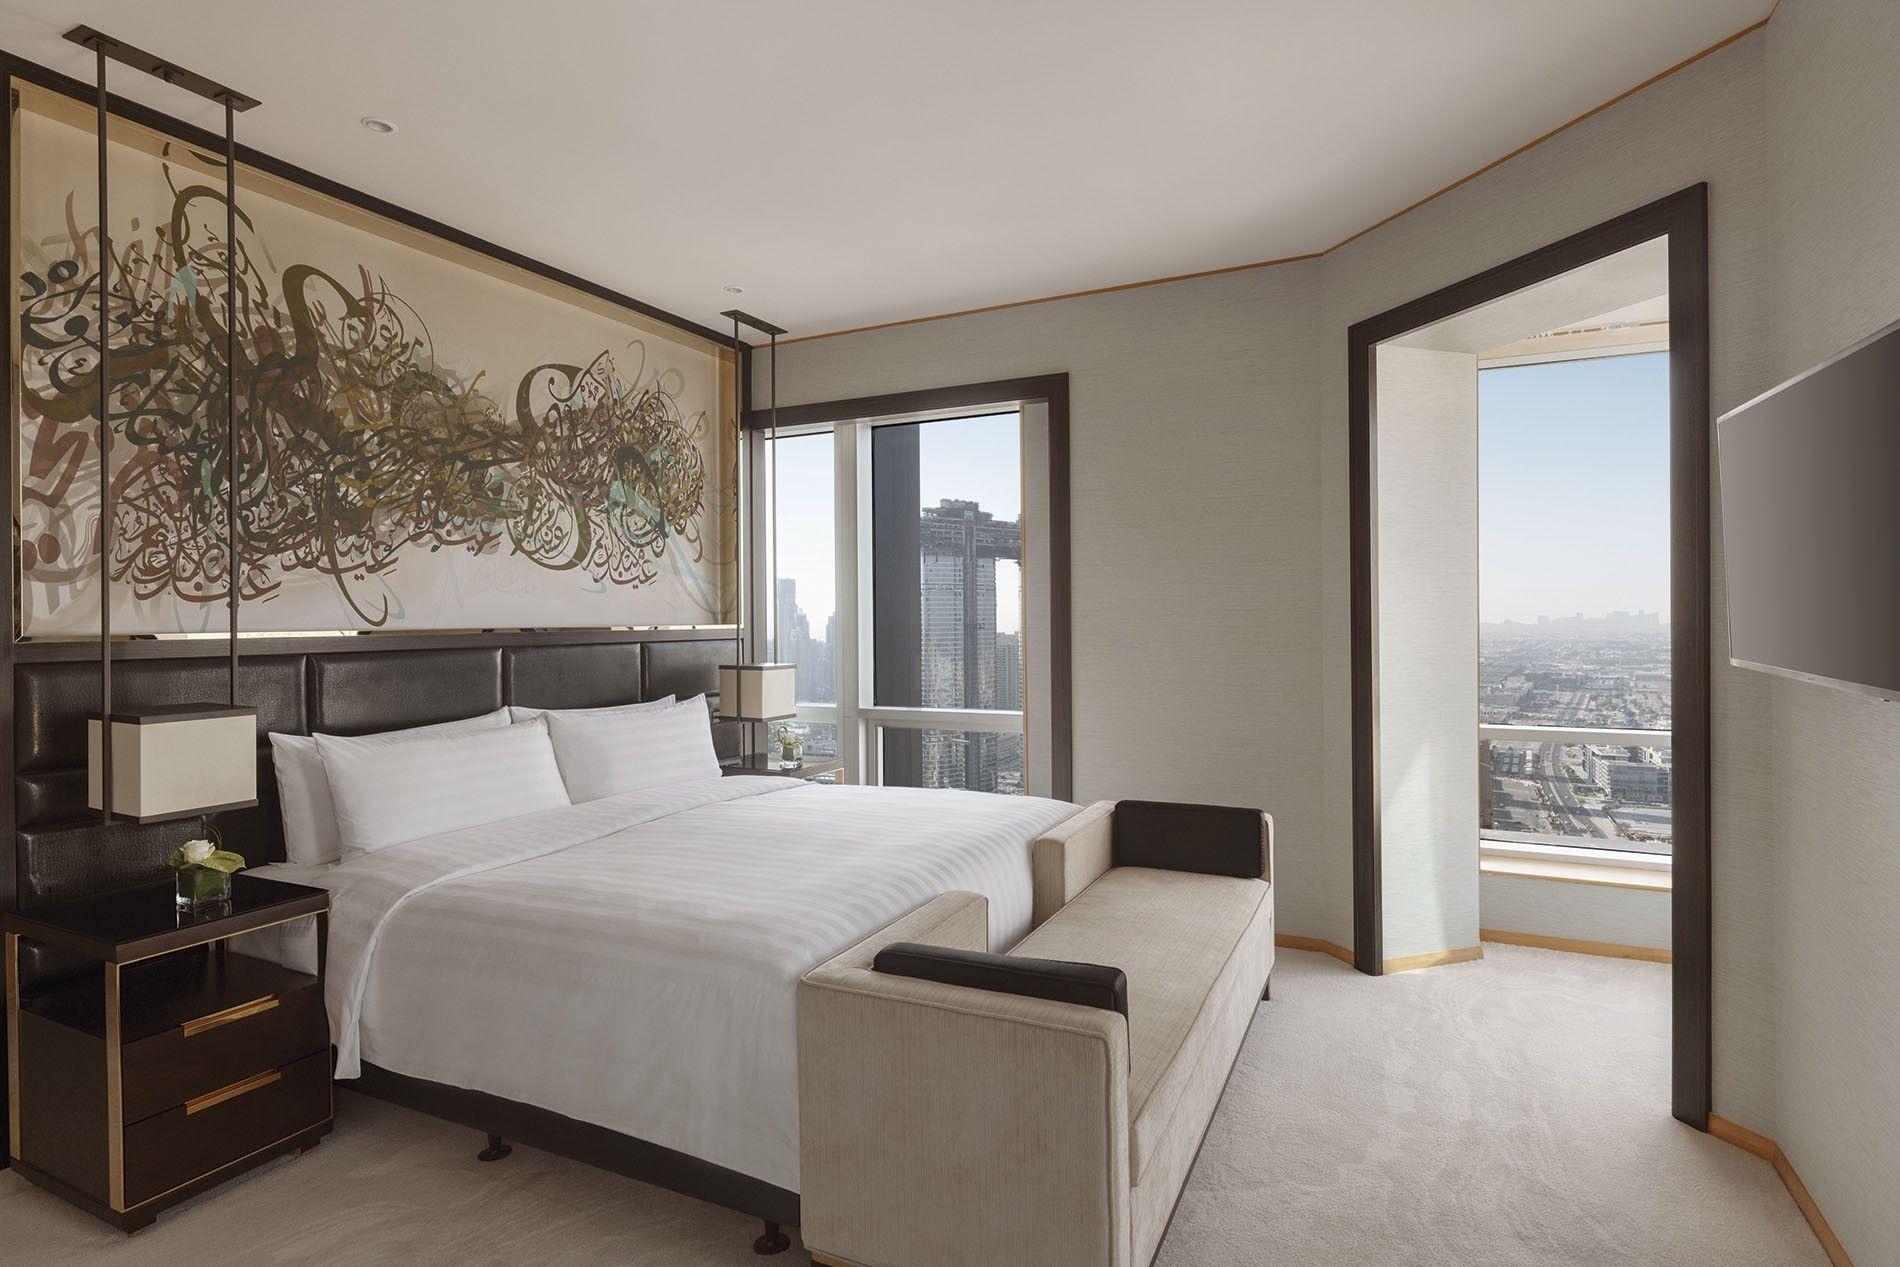 Shangri-La suite with a sea view.